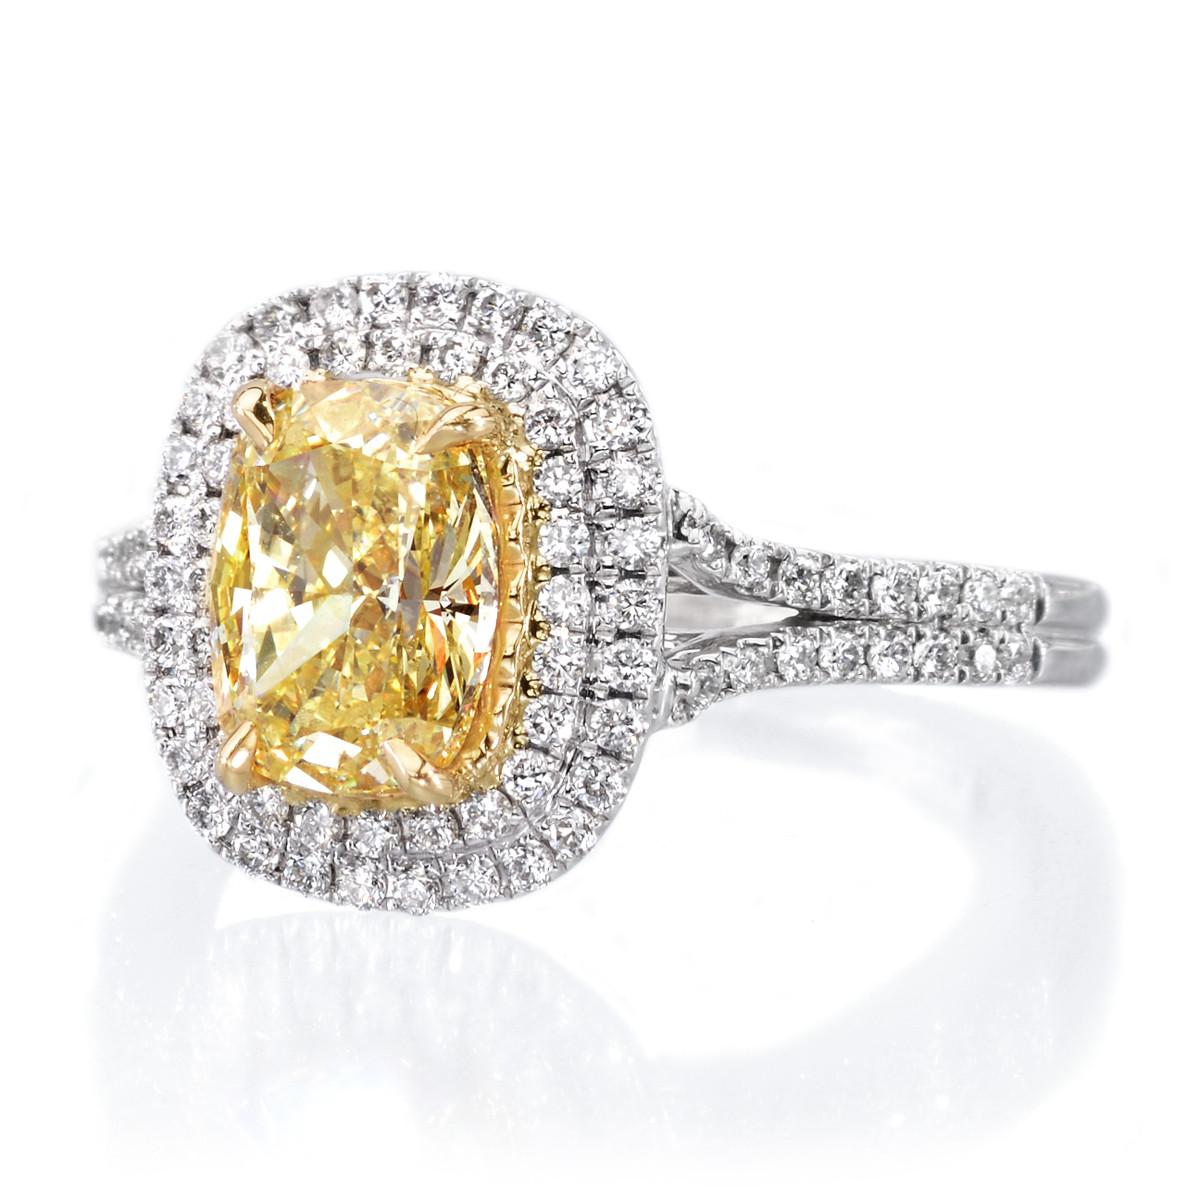 Dassi 18K Two-Tone Diamond Ring